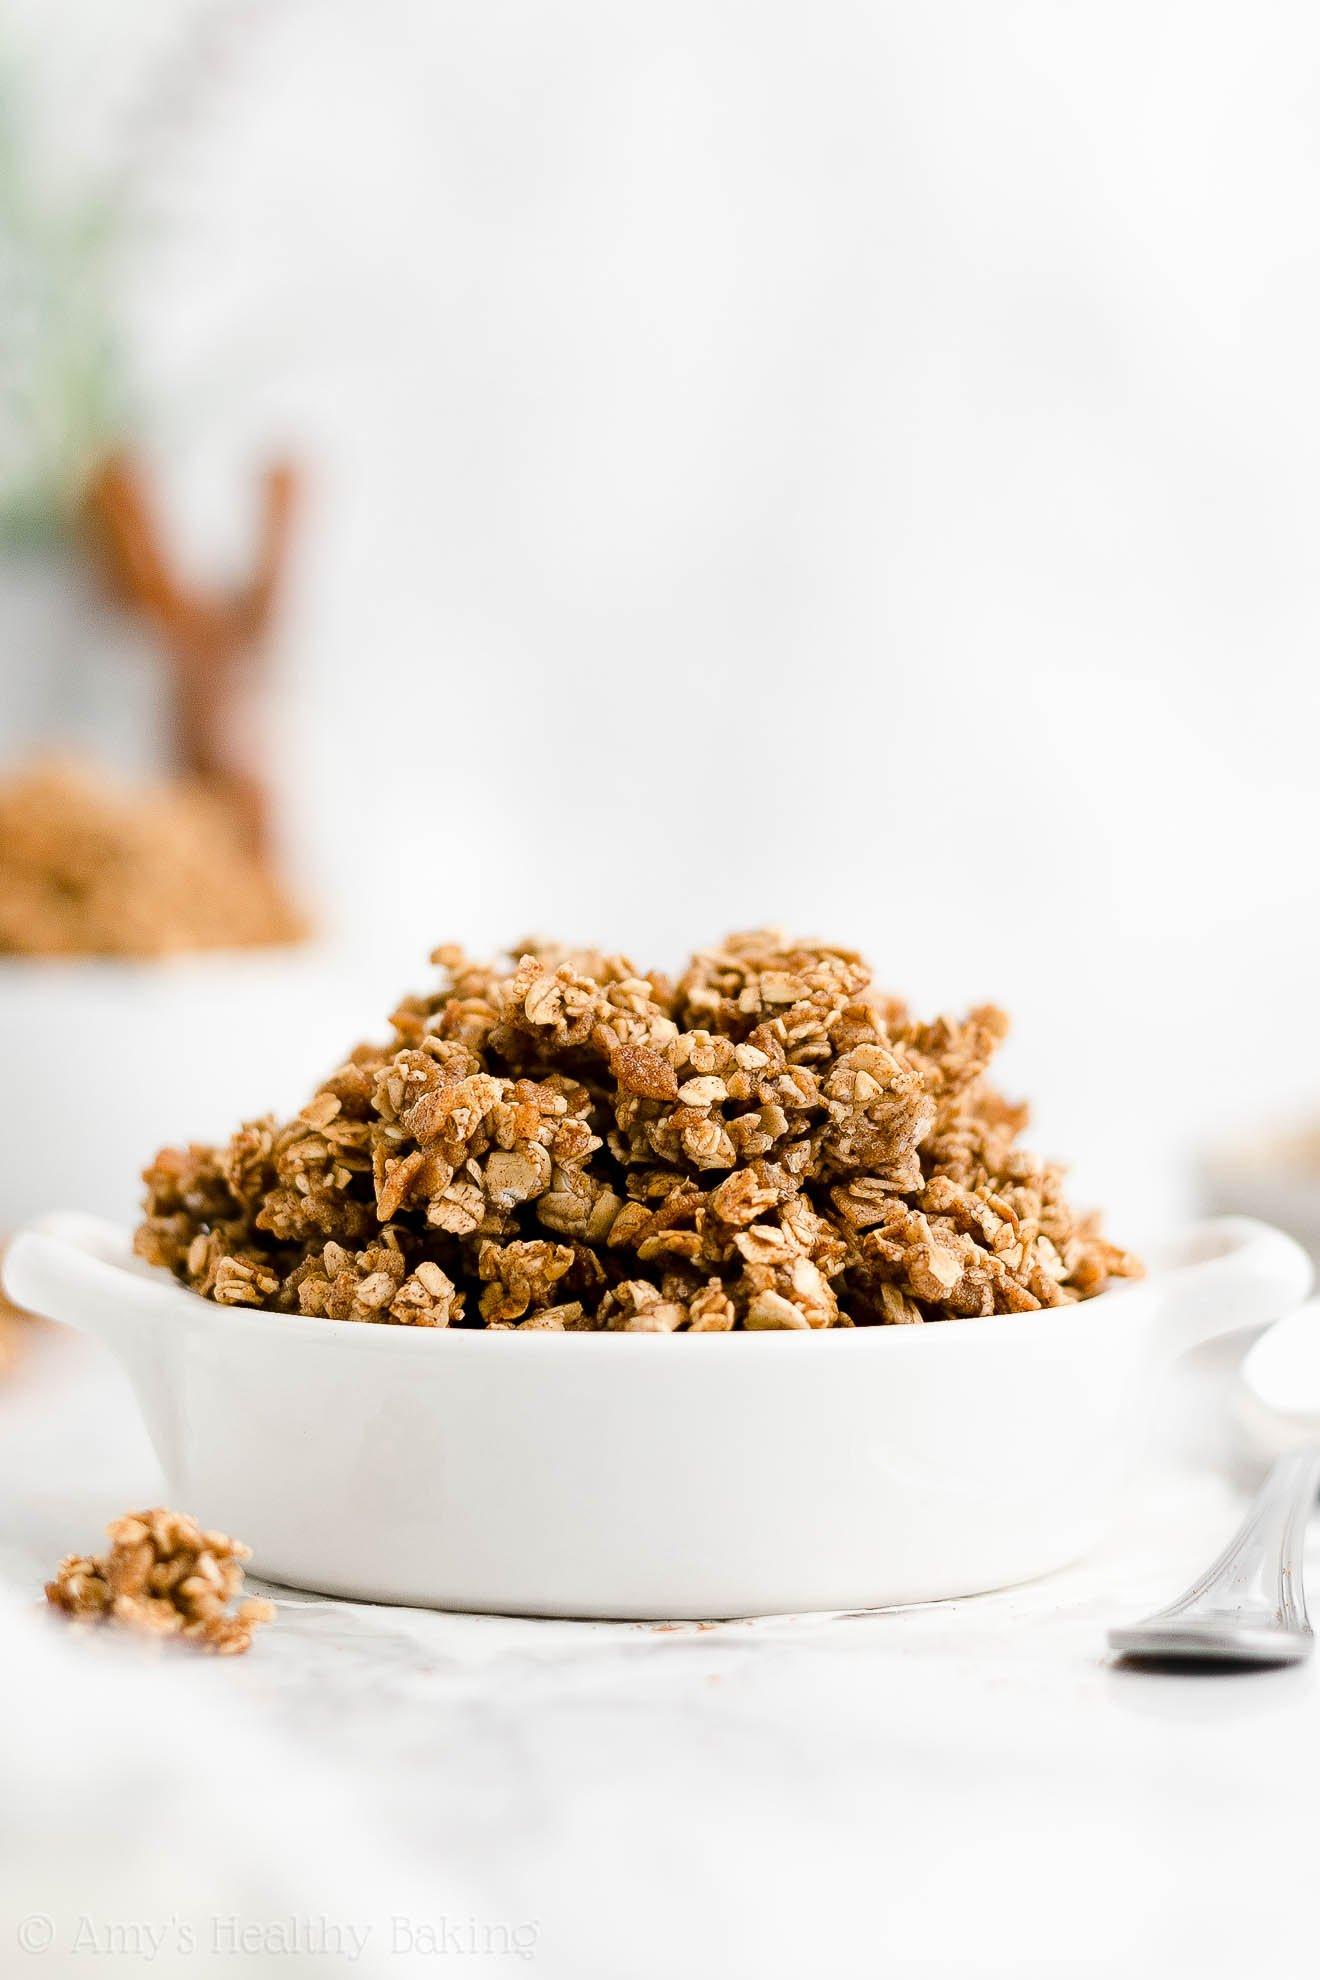 best healthy homemade granola recipe from scratch gluten free oil free